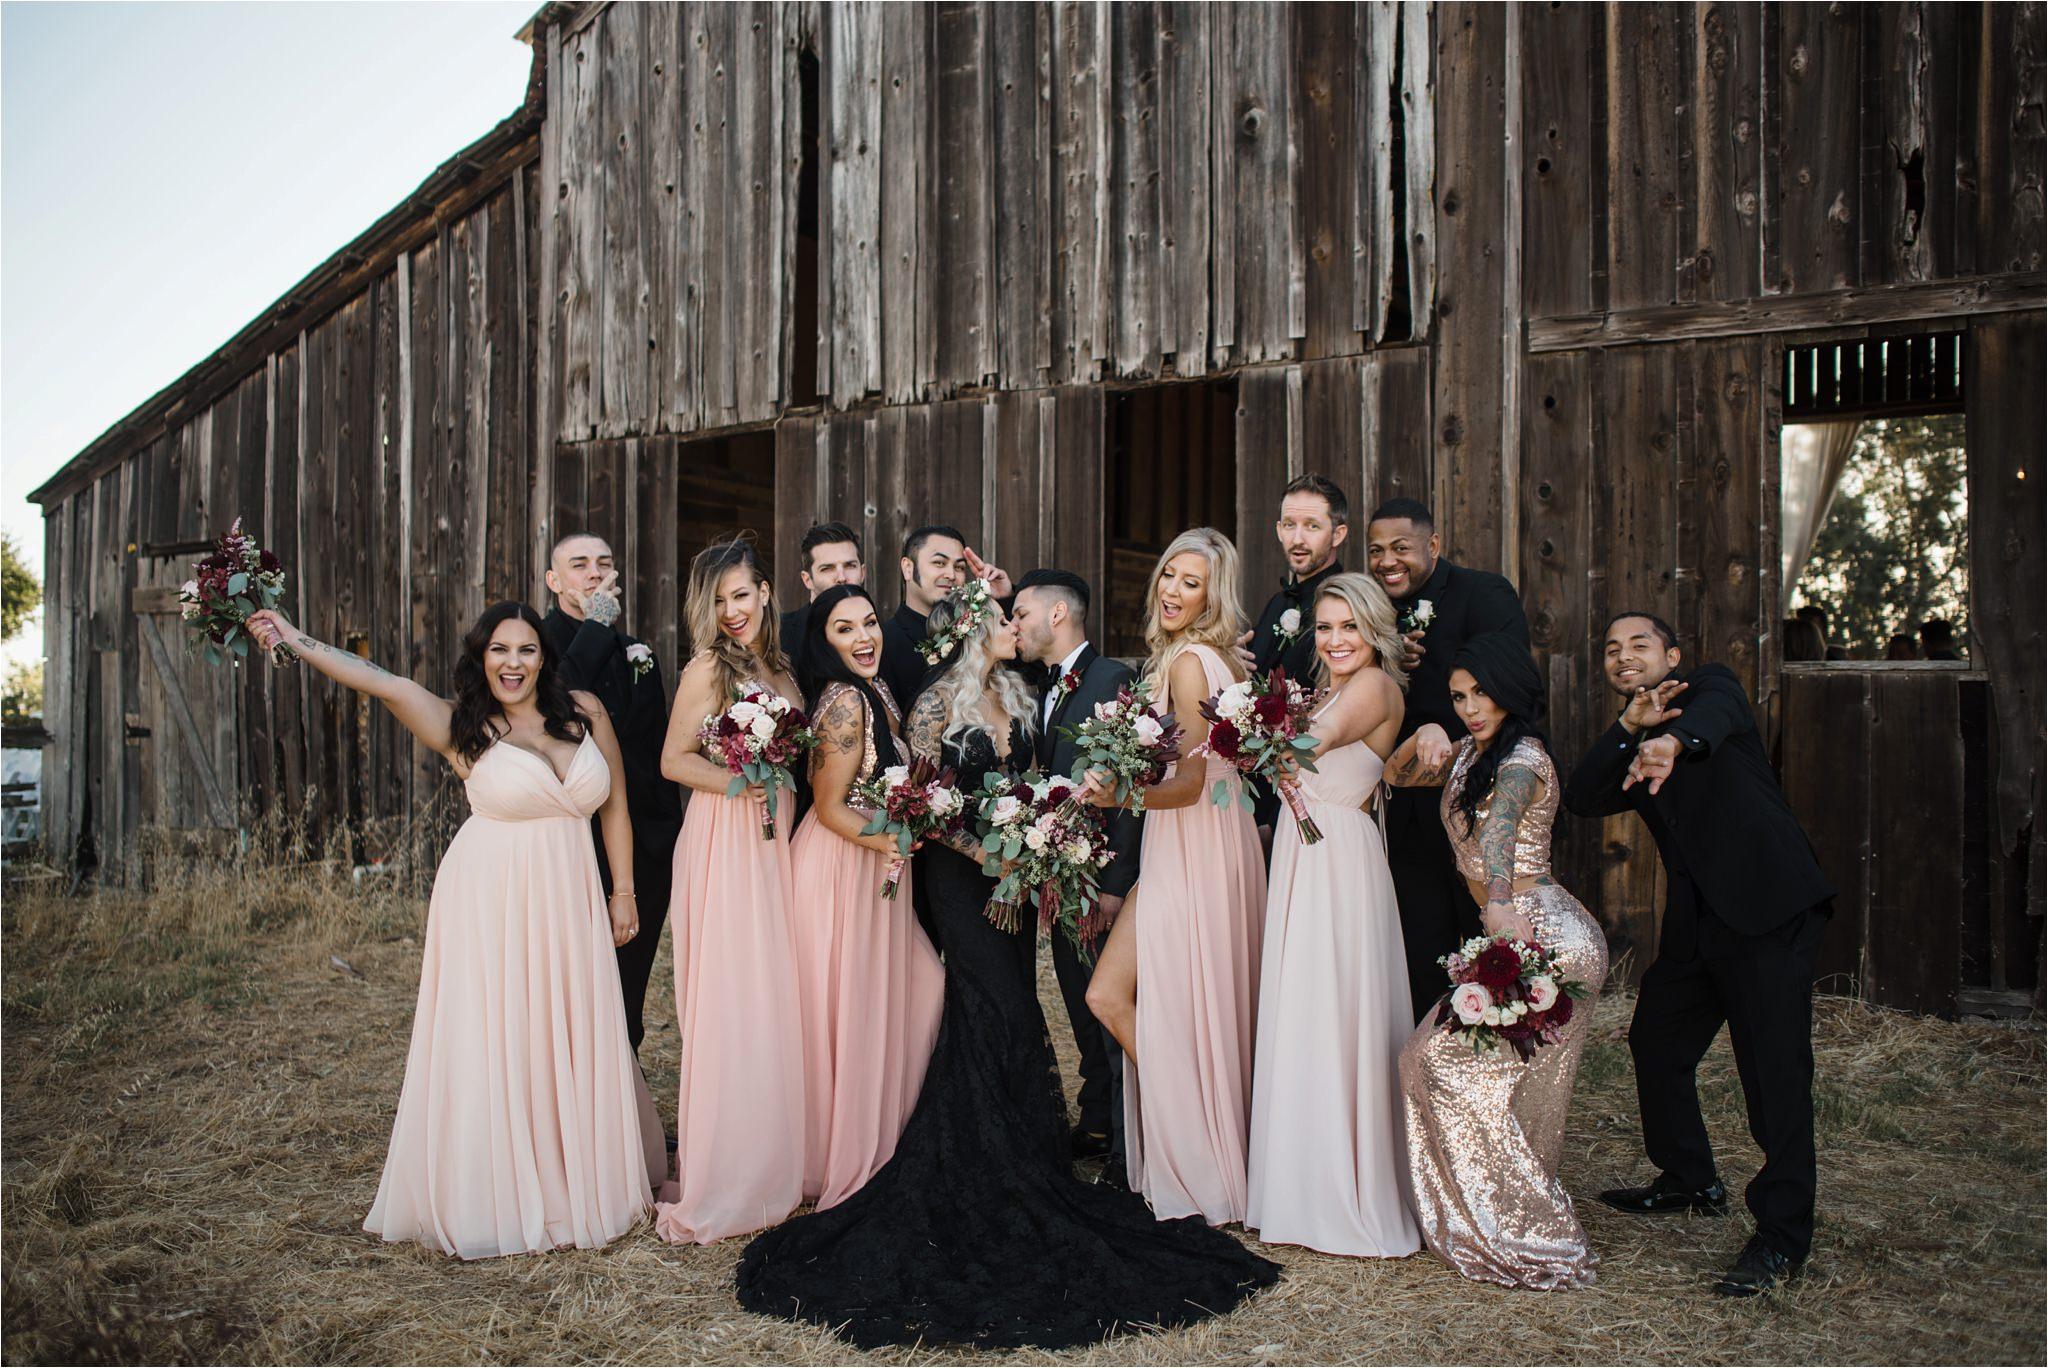 jessica-roman-photography-Stone Barn Ranch Wedding-Sacramento-Boise-Photographer-0022.jpg